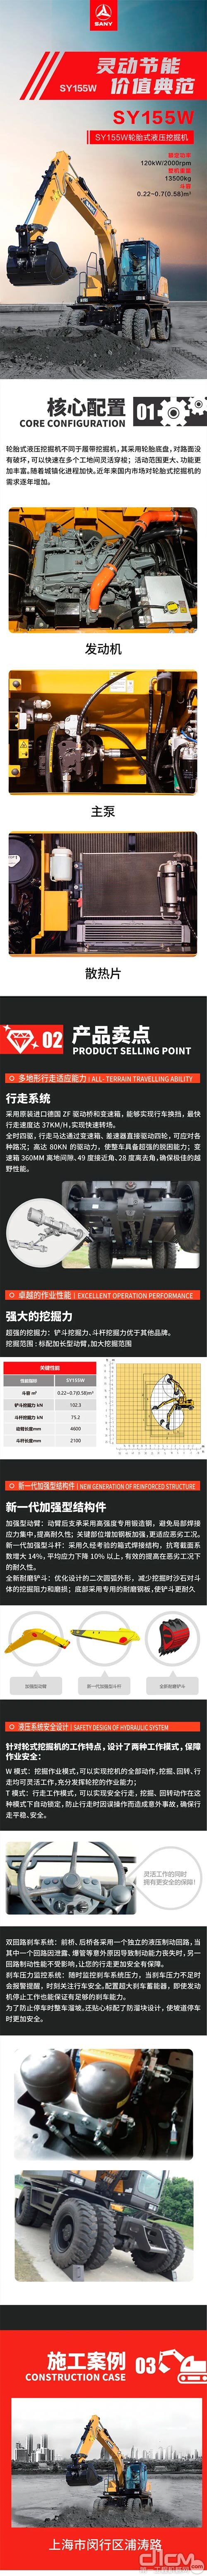 三一SY155W轮挖介绍